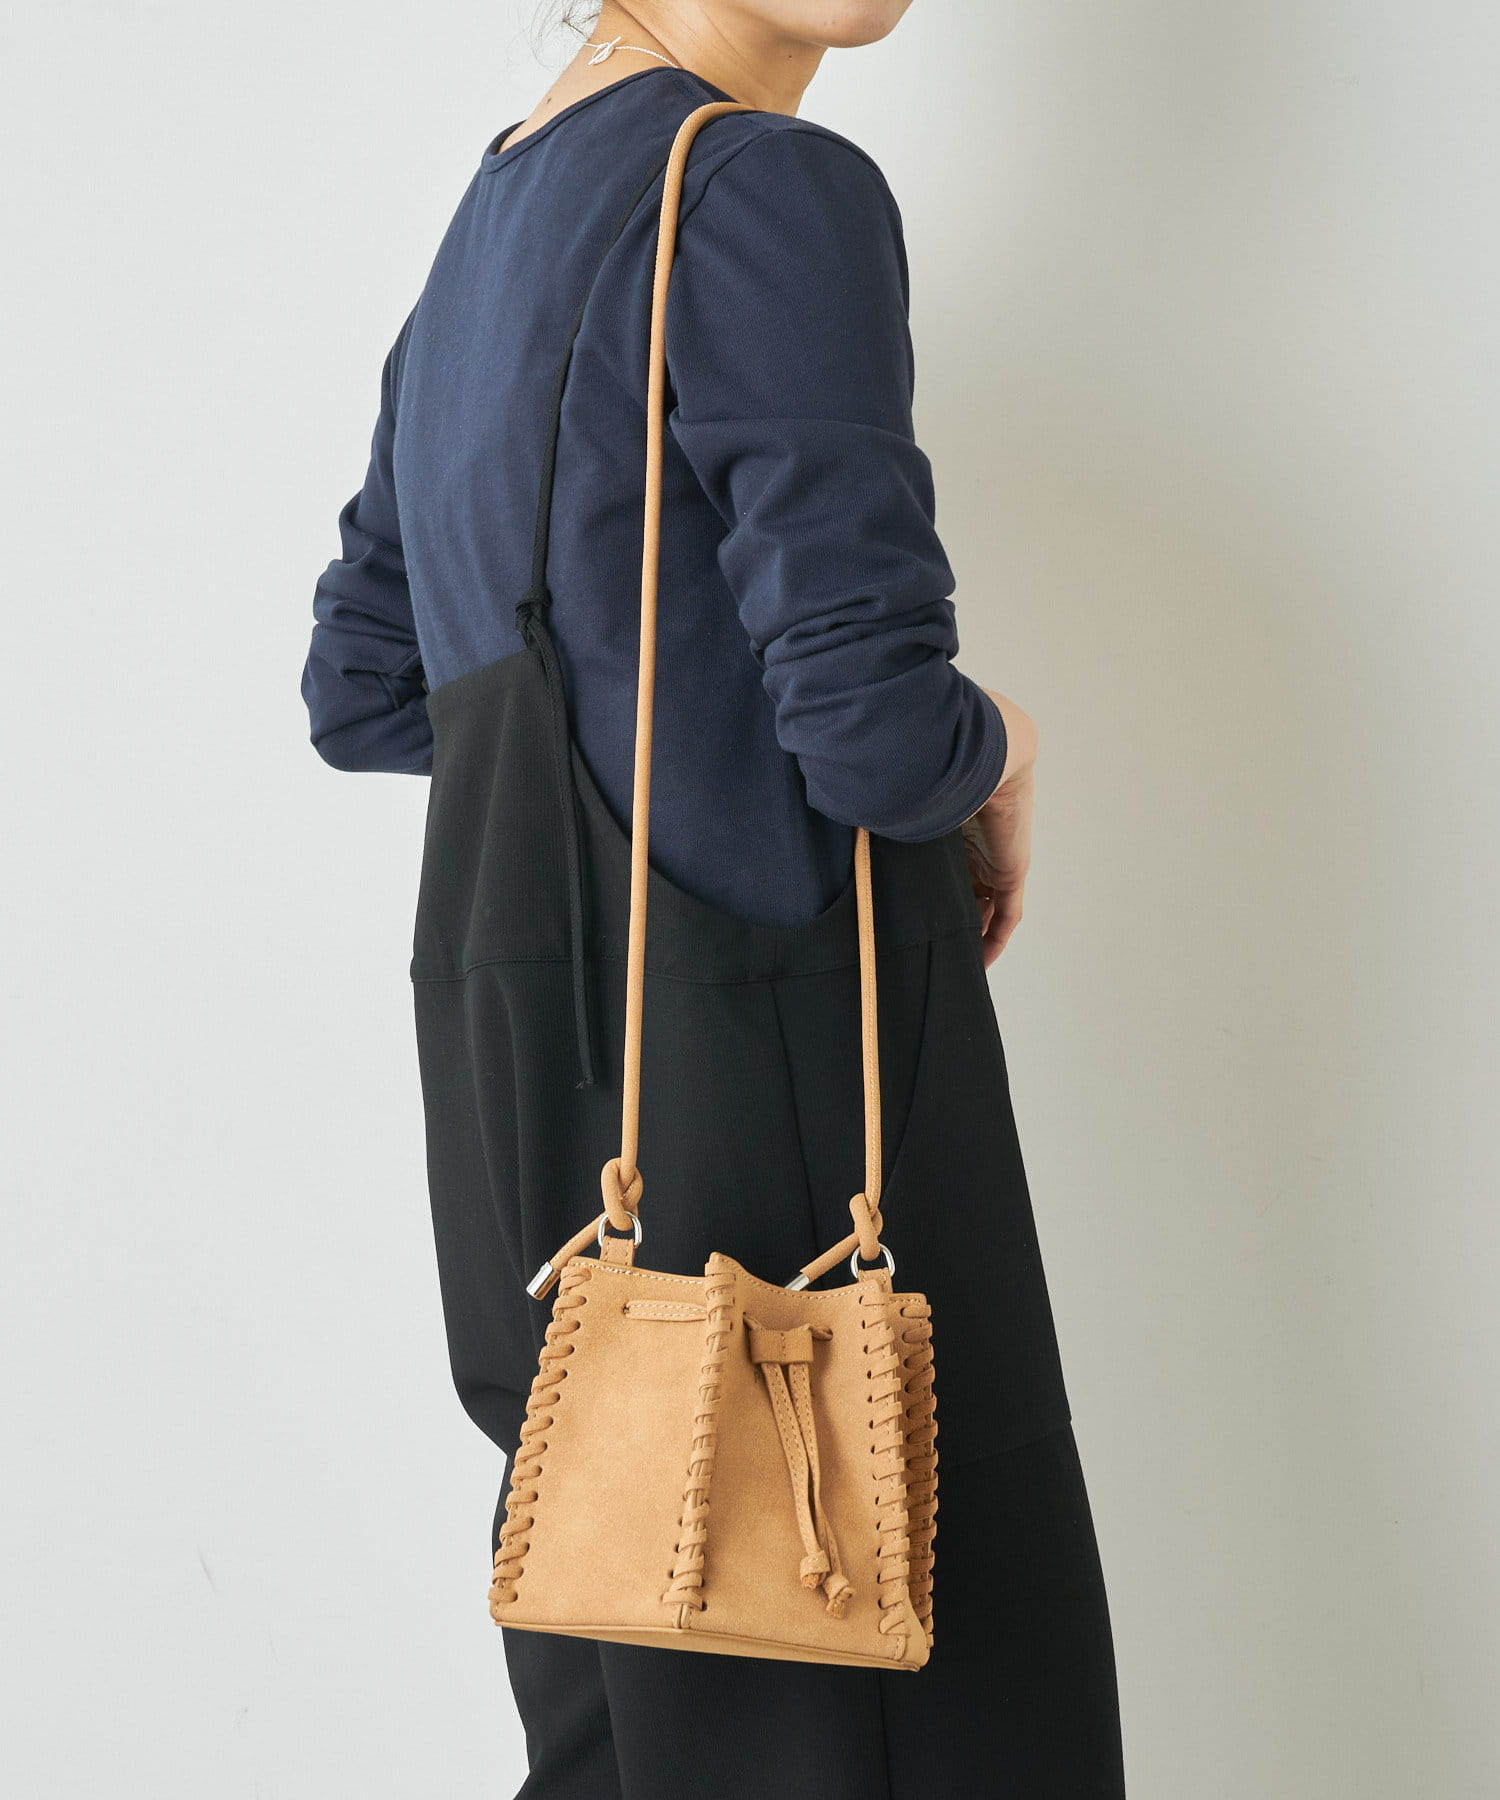 Omekashi(オメカシ) 【WEB限定】PROTCOL Hexagon Leather Bag